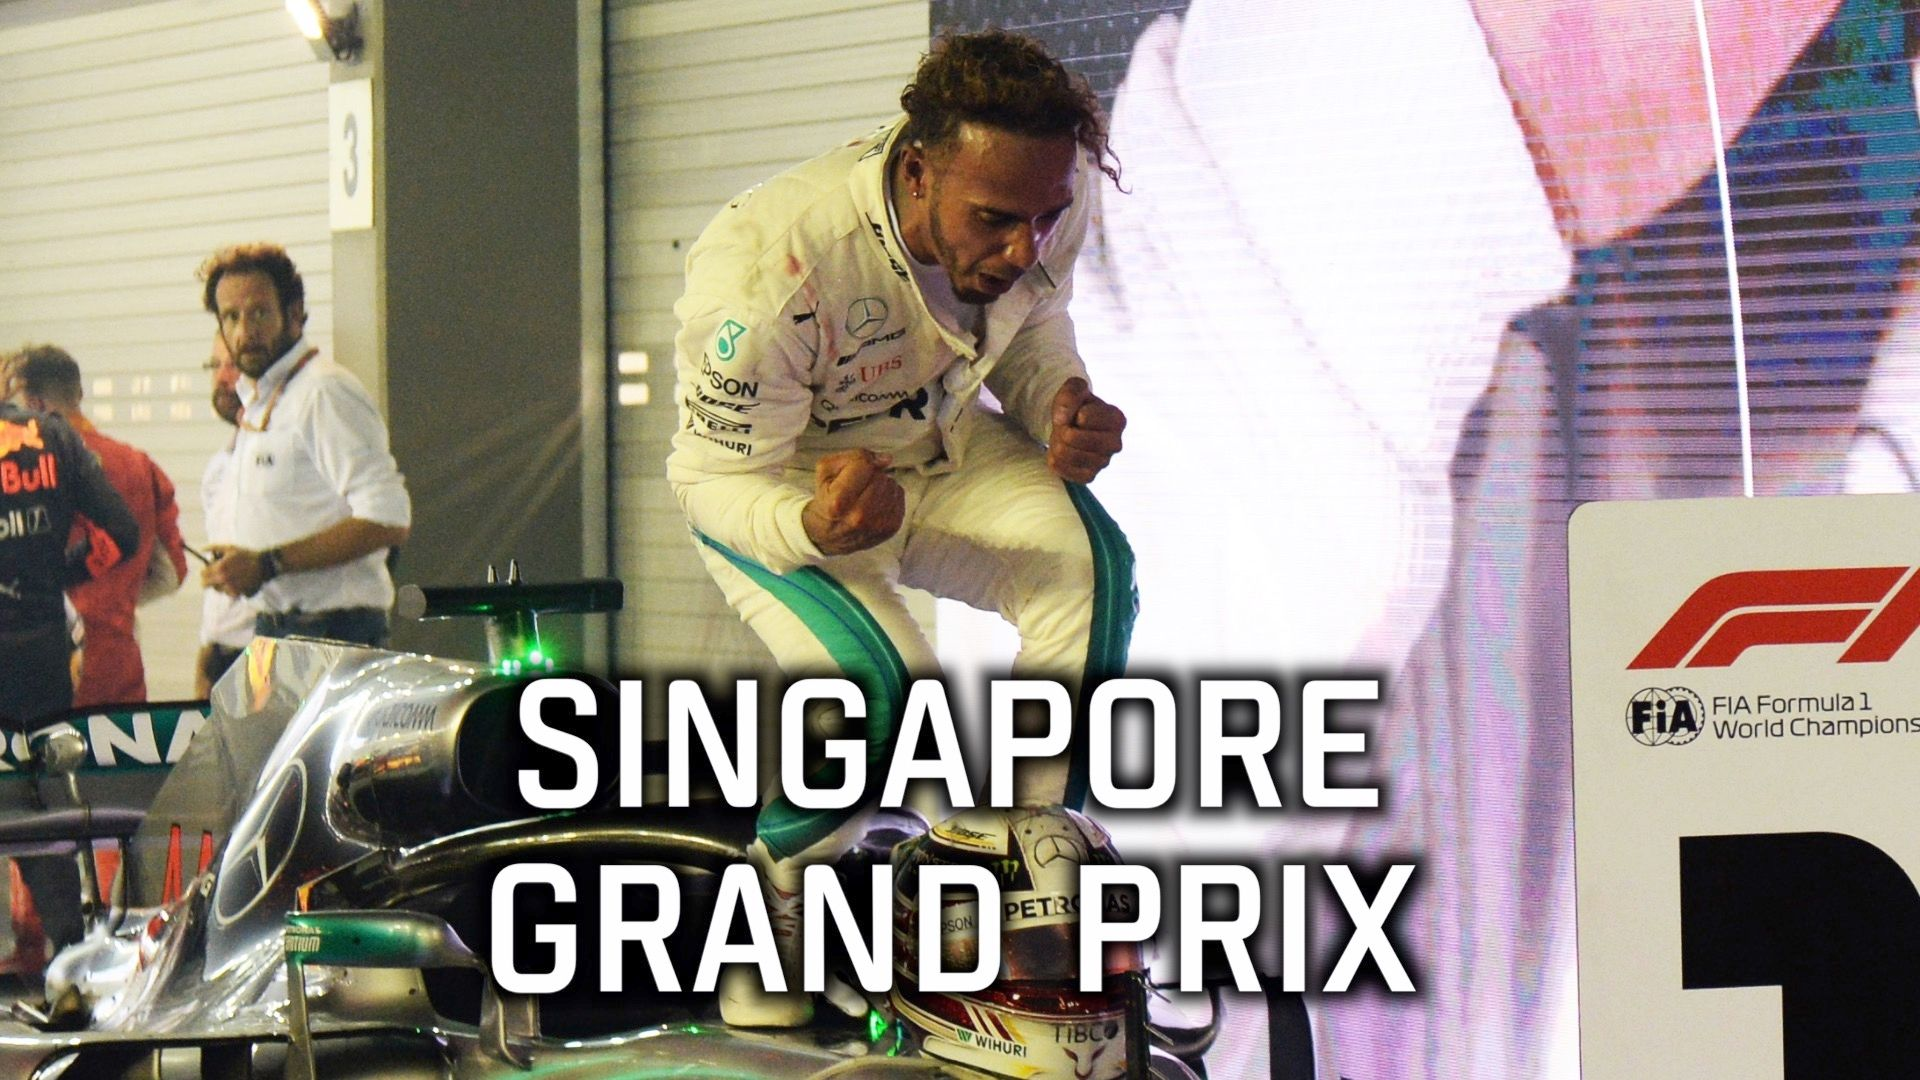 Social story of the Singapore Grand Prix